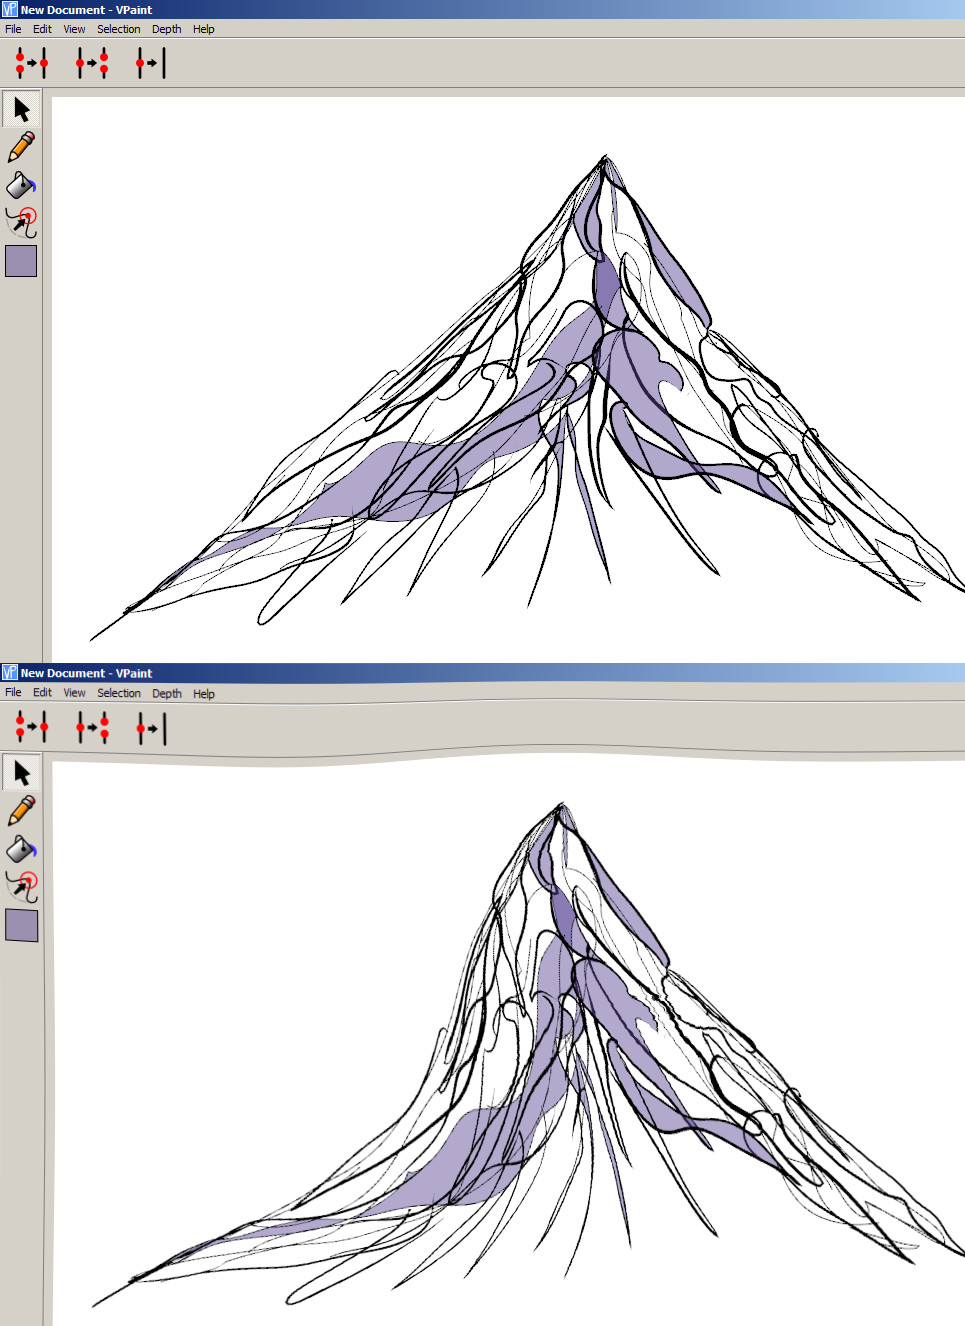 Stratovolcano coloring, Download Stratovolcano coloring